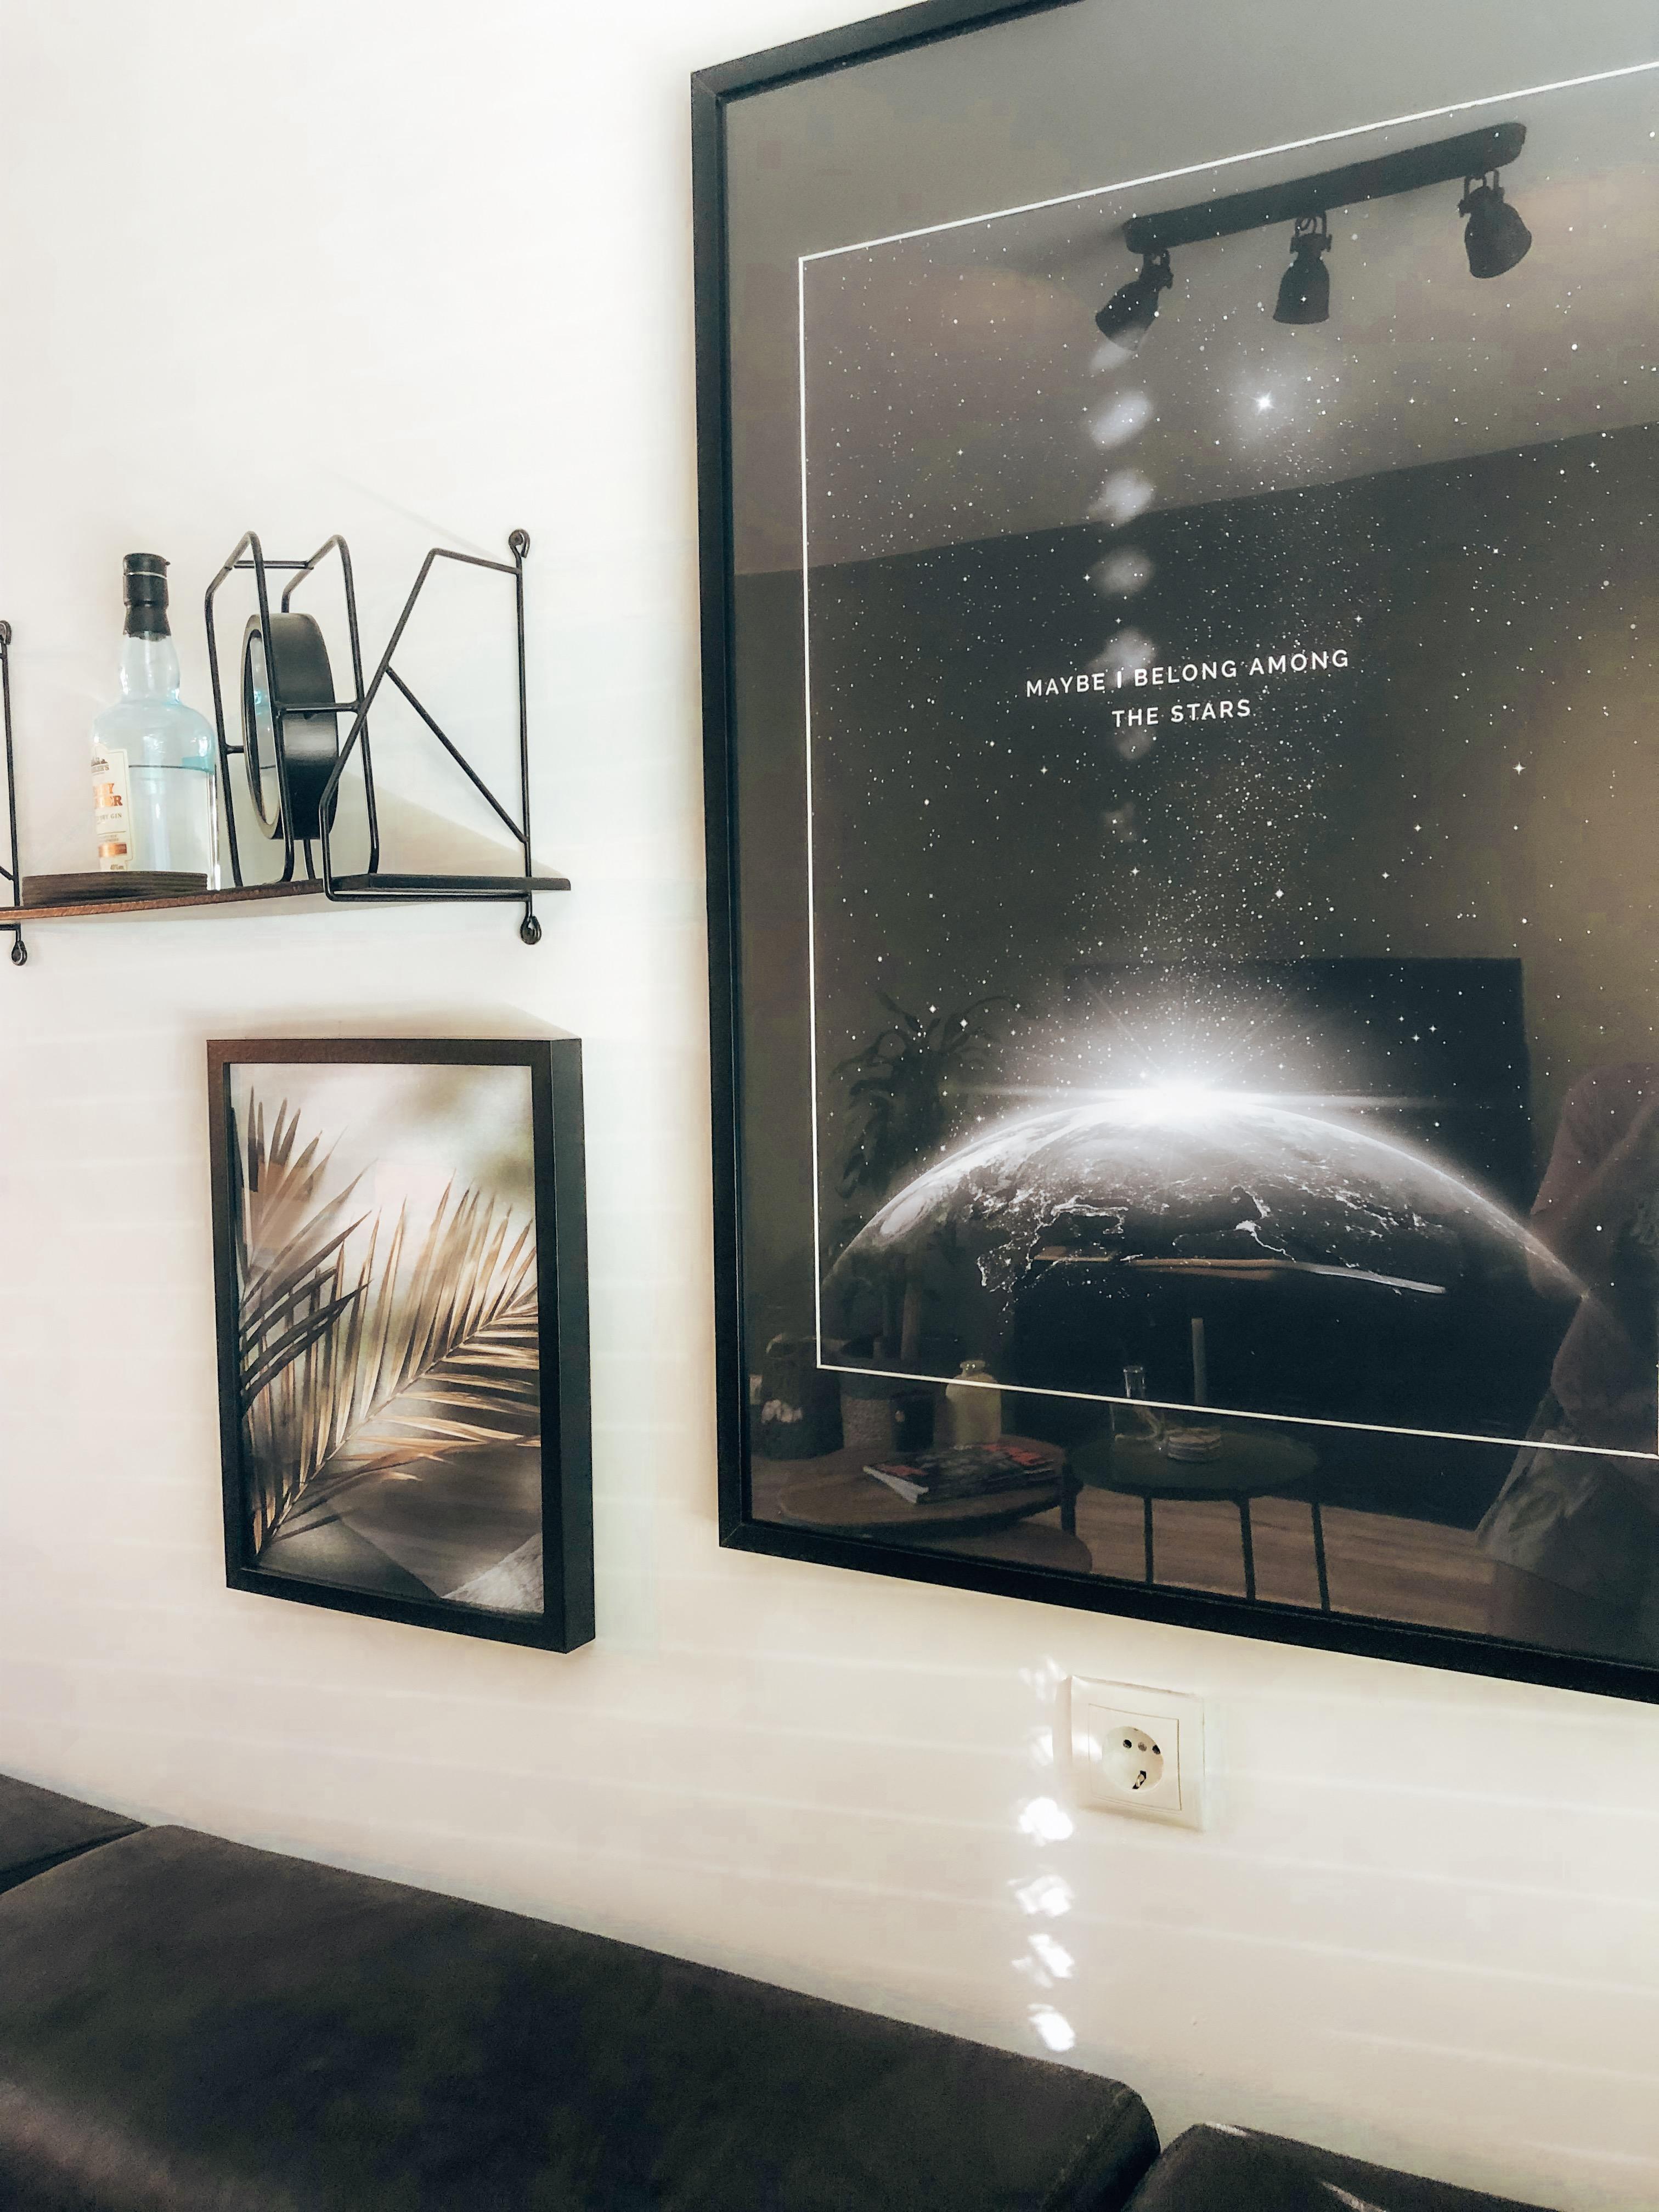 zitmaxx, wonen, interieur, salontafels, blogger, nepbloemen, posters, desenio